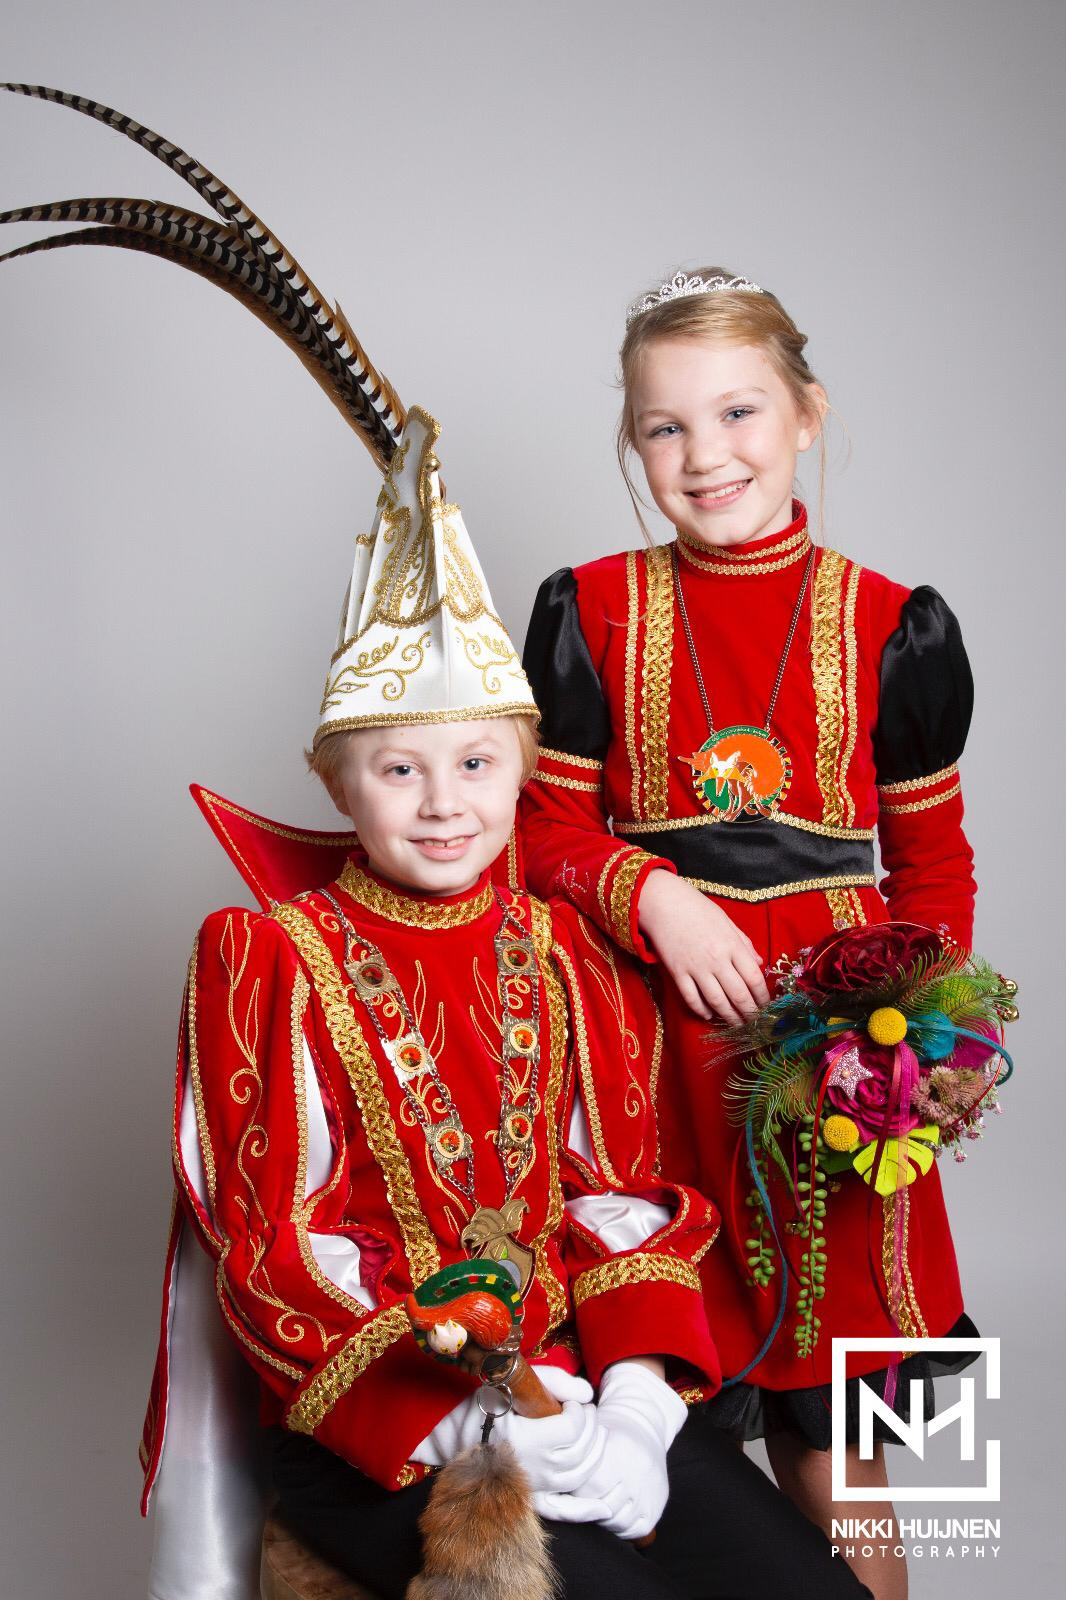 Jeugdprins Keano en Jeugdprinses Rosalie nieuwe Jeugdhoogheden